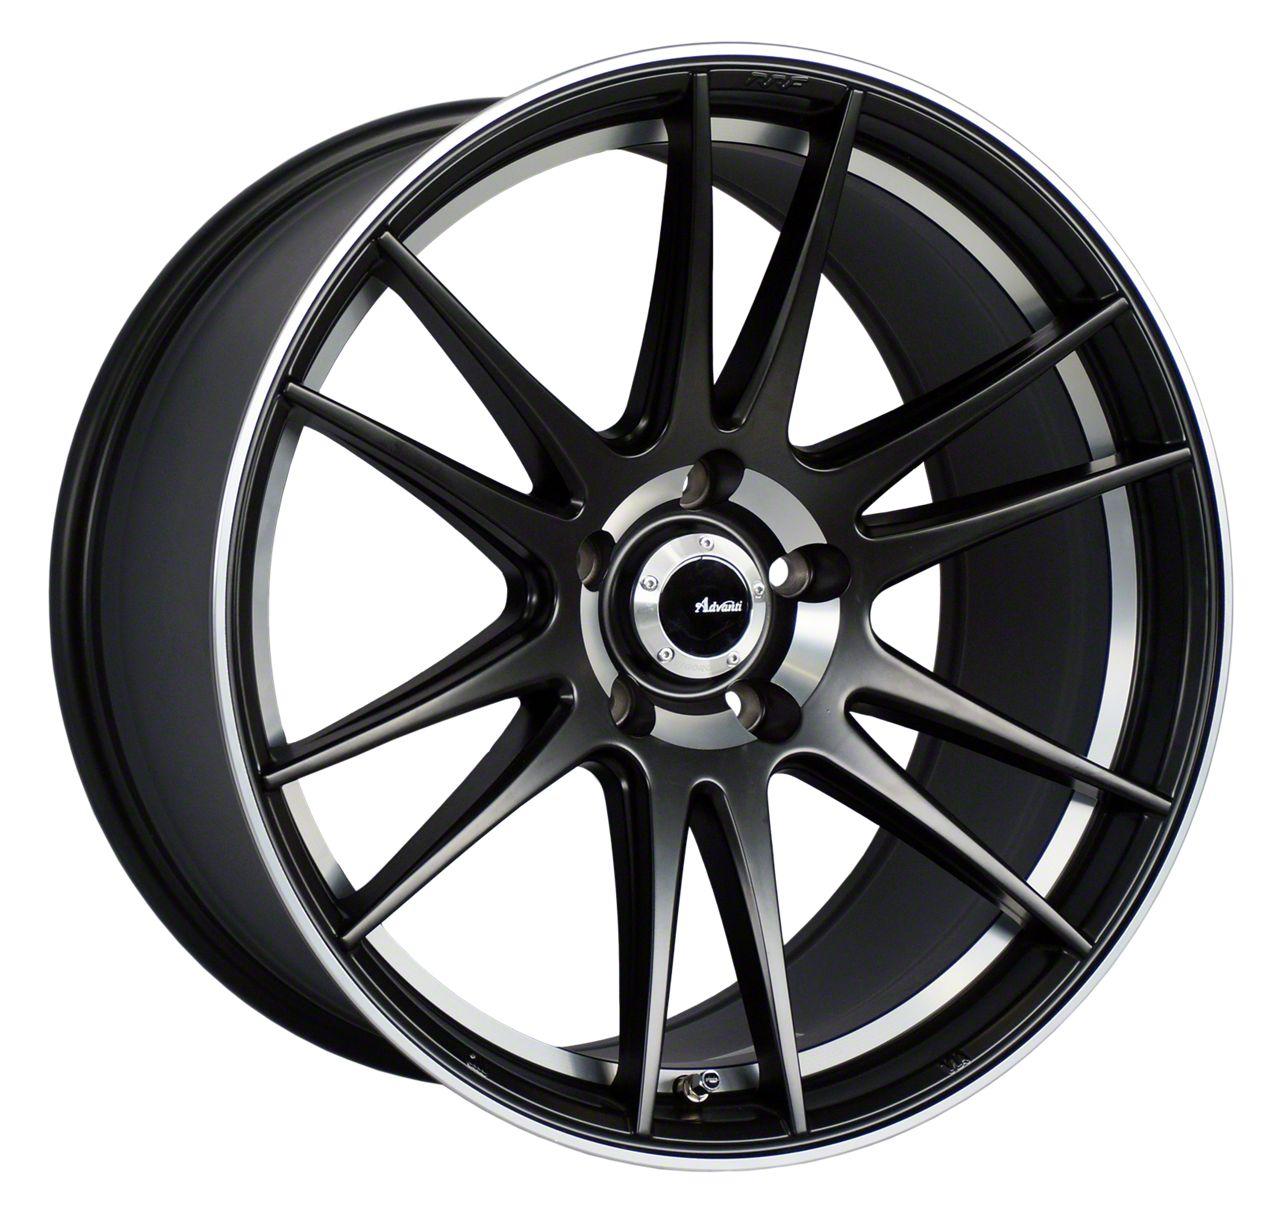 Advanti Optimo Matte Black w/ Machined Lip Wheel - 19x9.5 (05-14 All)